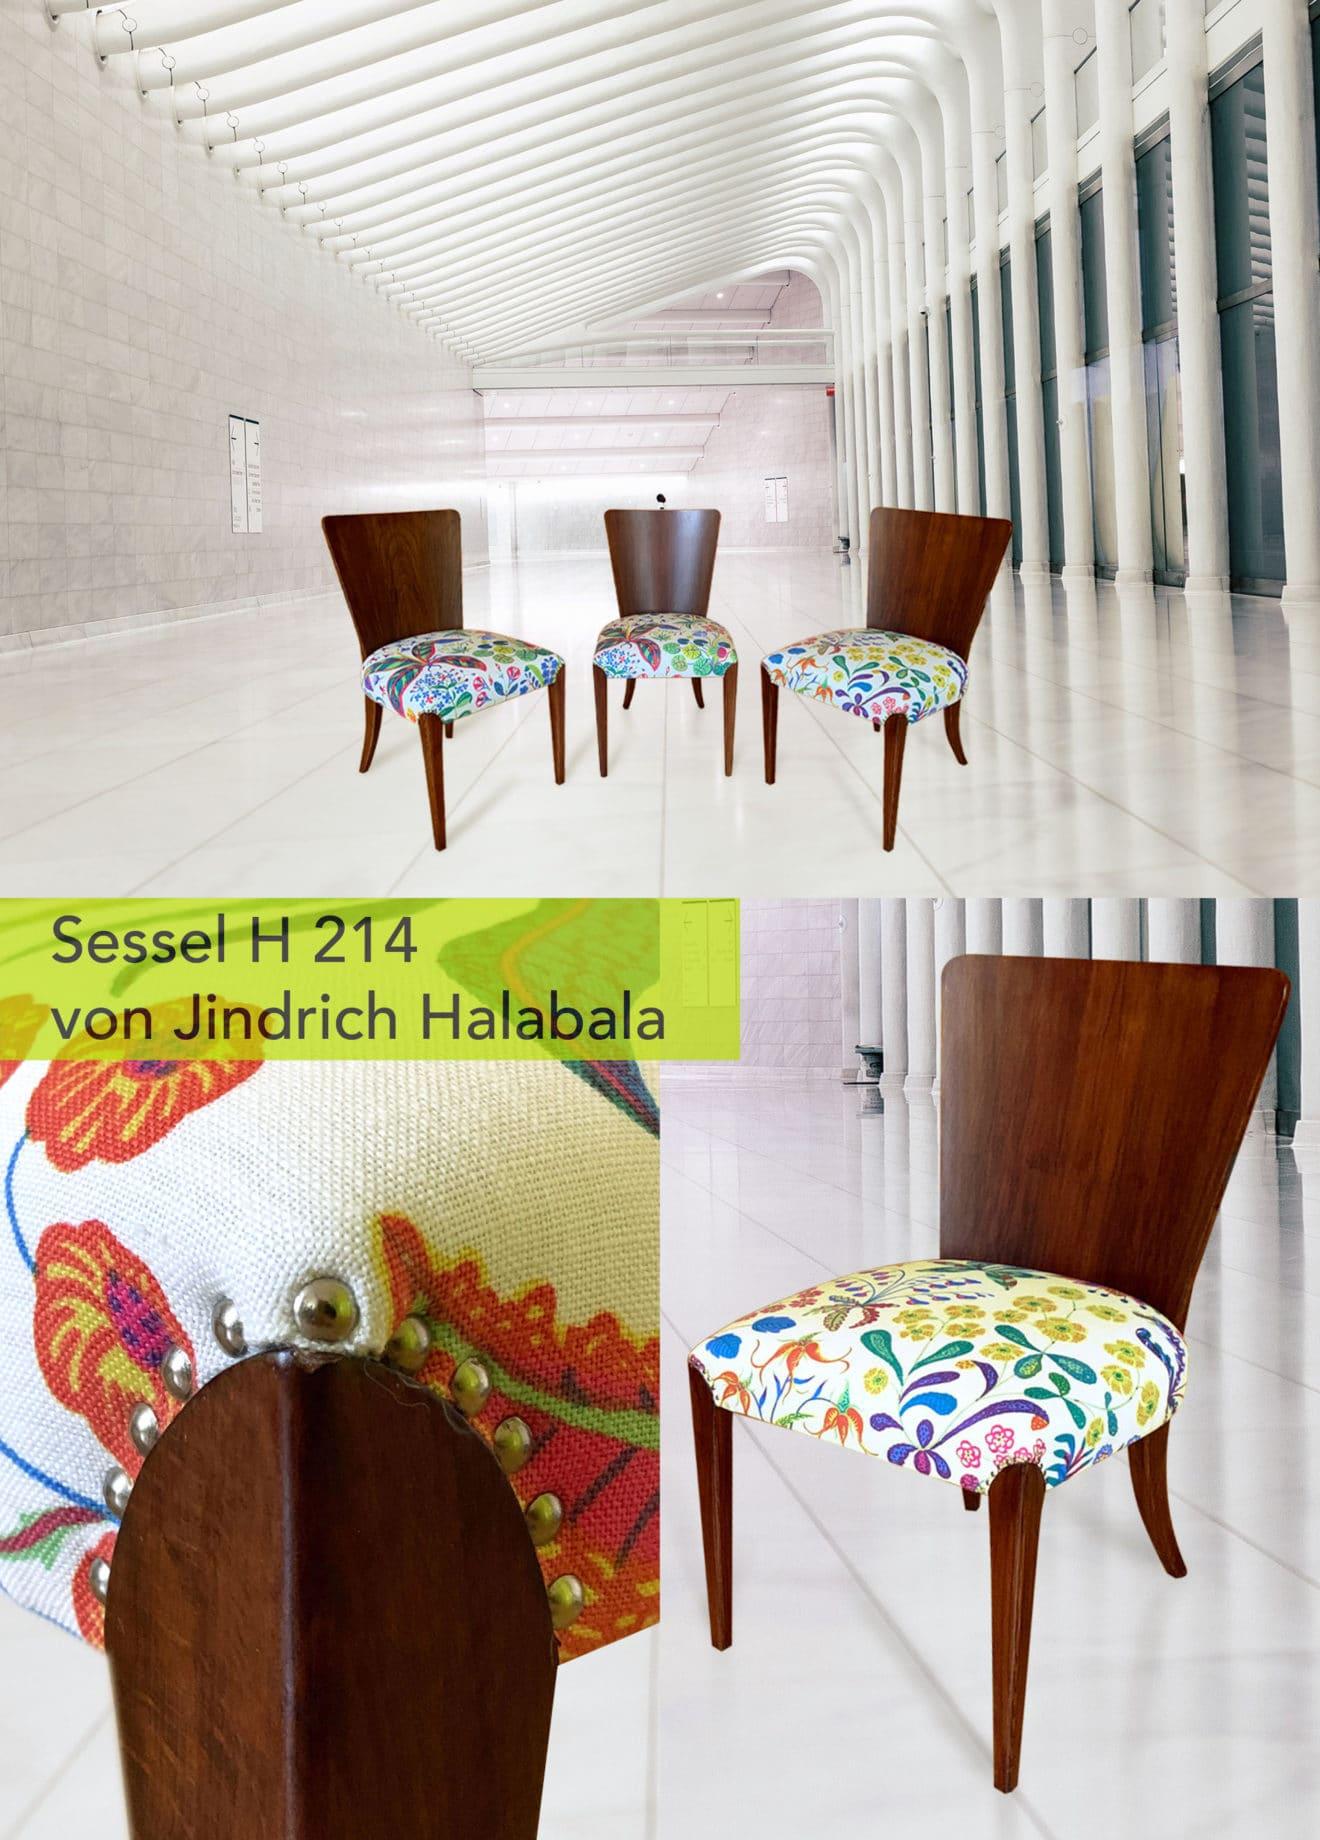 Kabinettstücke Newsletter Sessel H 216 mit Titel